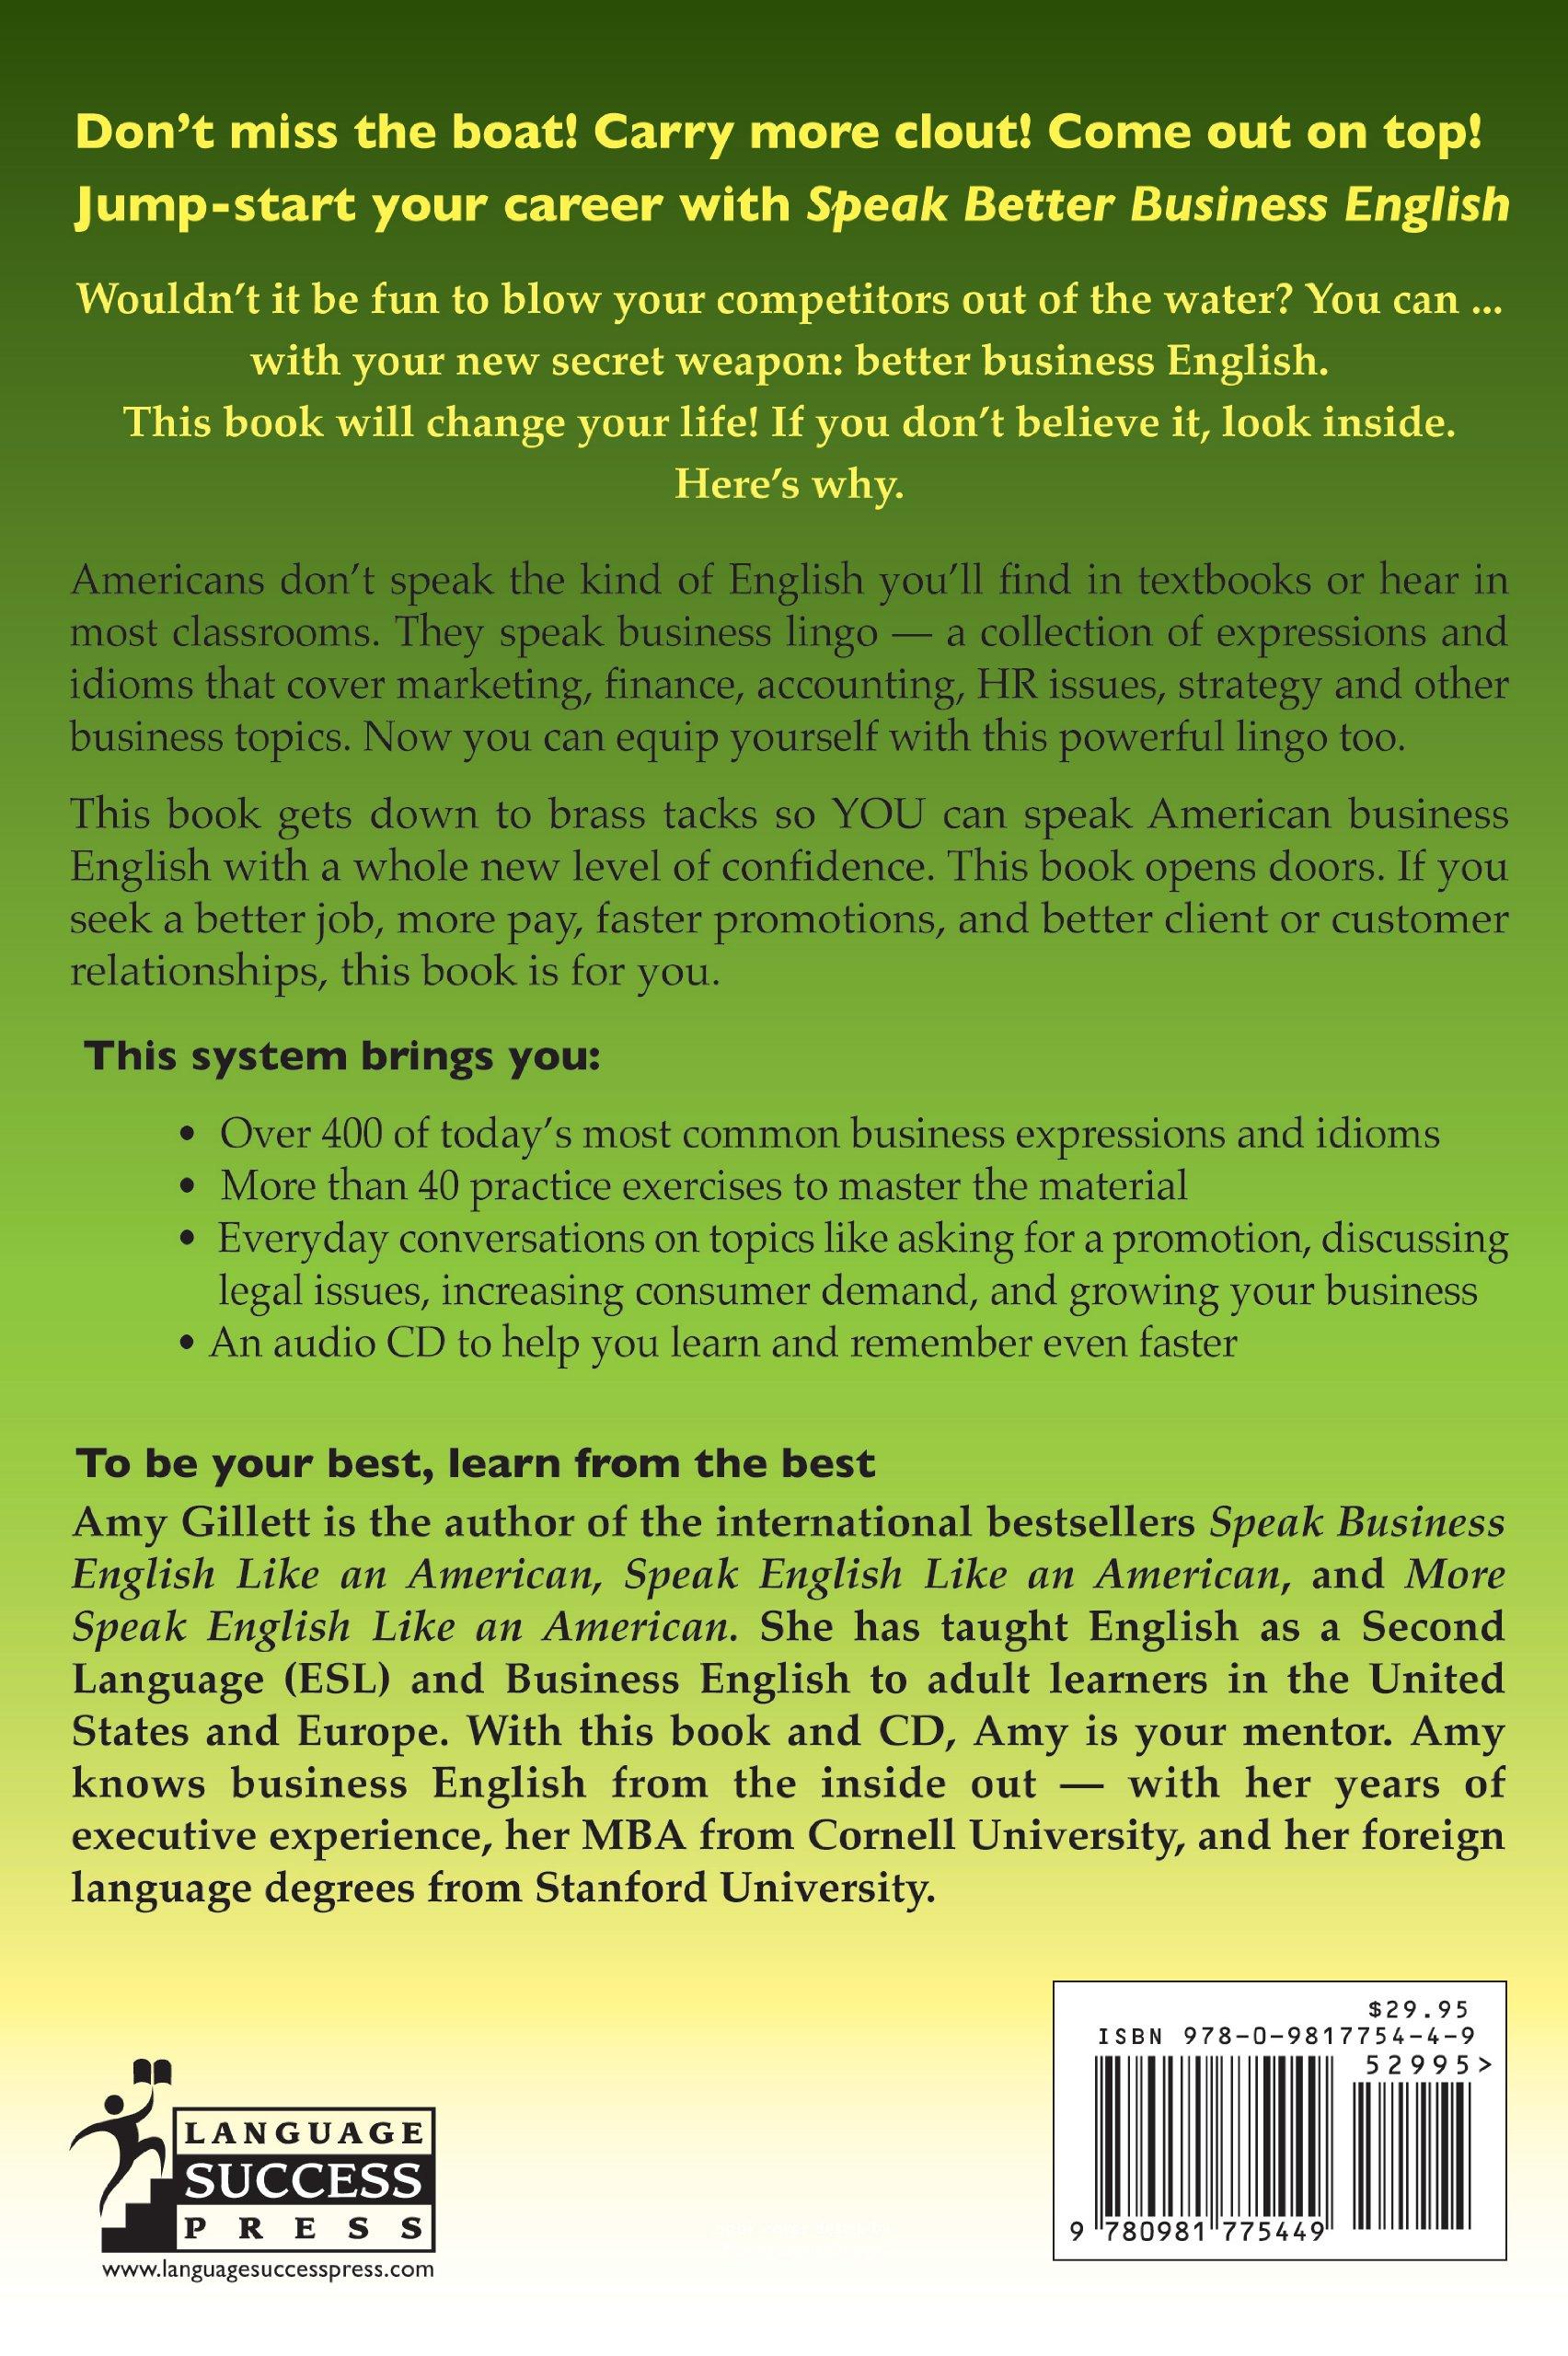 Speak Better Business English and Make More Money (Book & Audio CD): Amy  Gillett, Evgenii Kran: 9780981775449: Amazon.com: Books